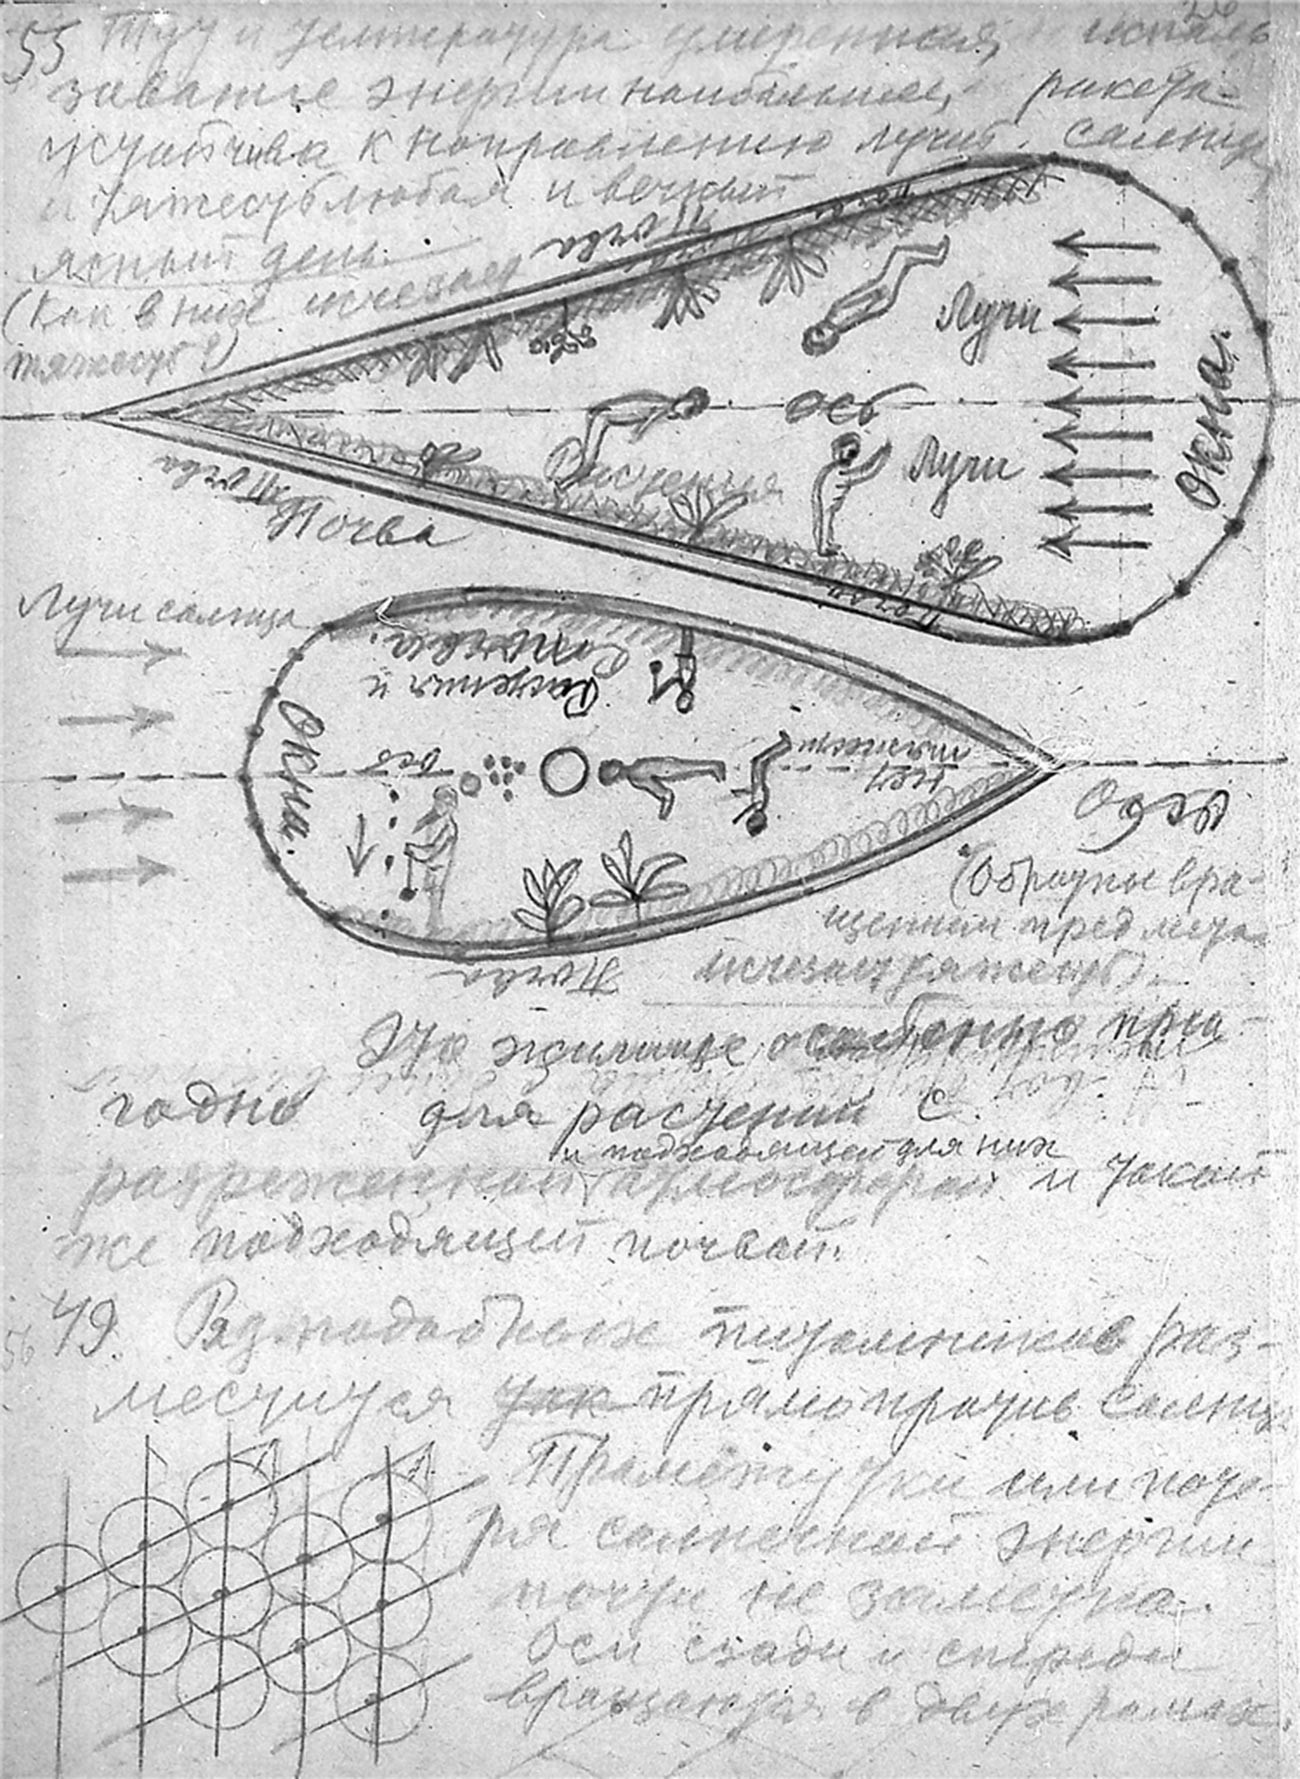 Deskripsi dan ilustrasi Tsiolkovsky tentang rumah kaca pesawat ruang angkasa.